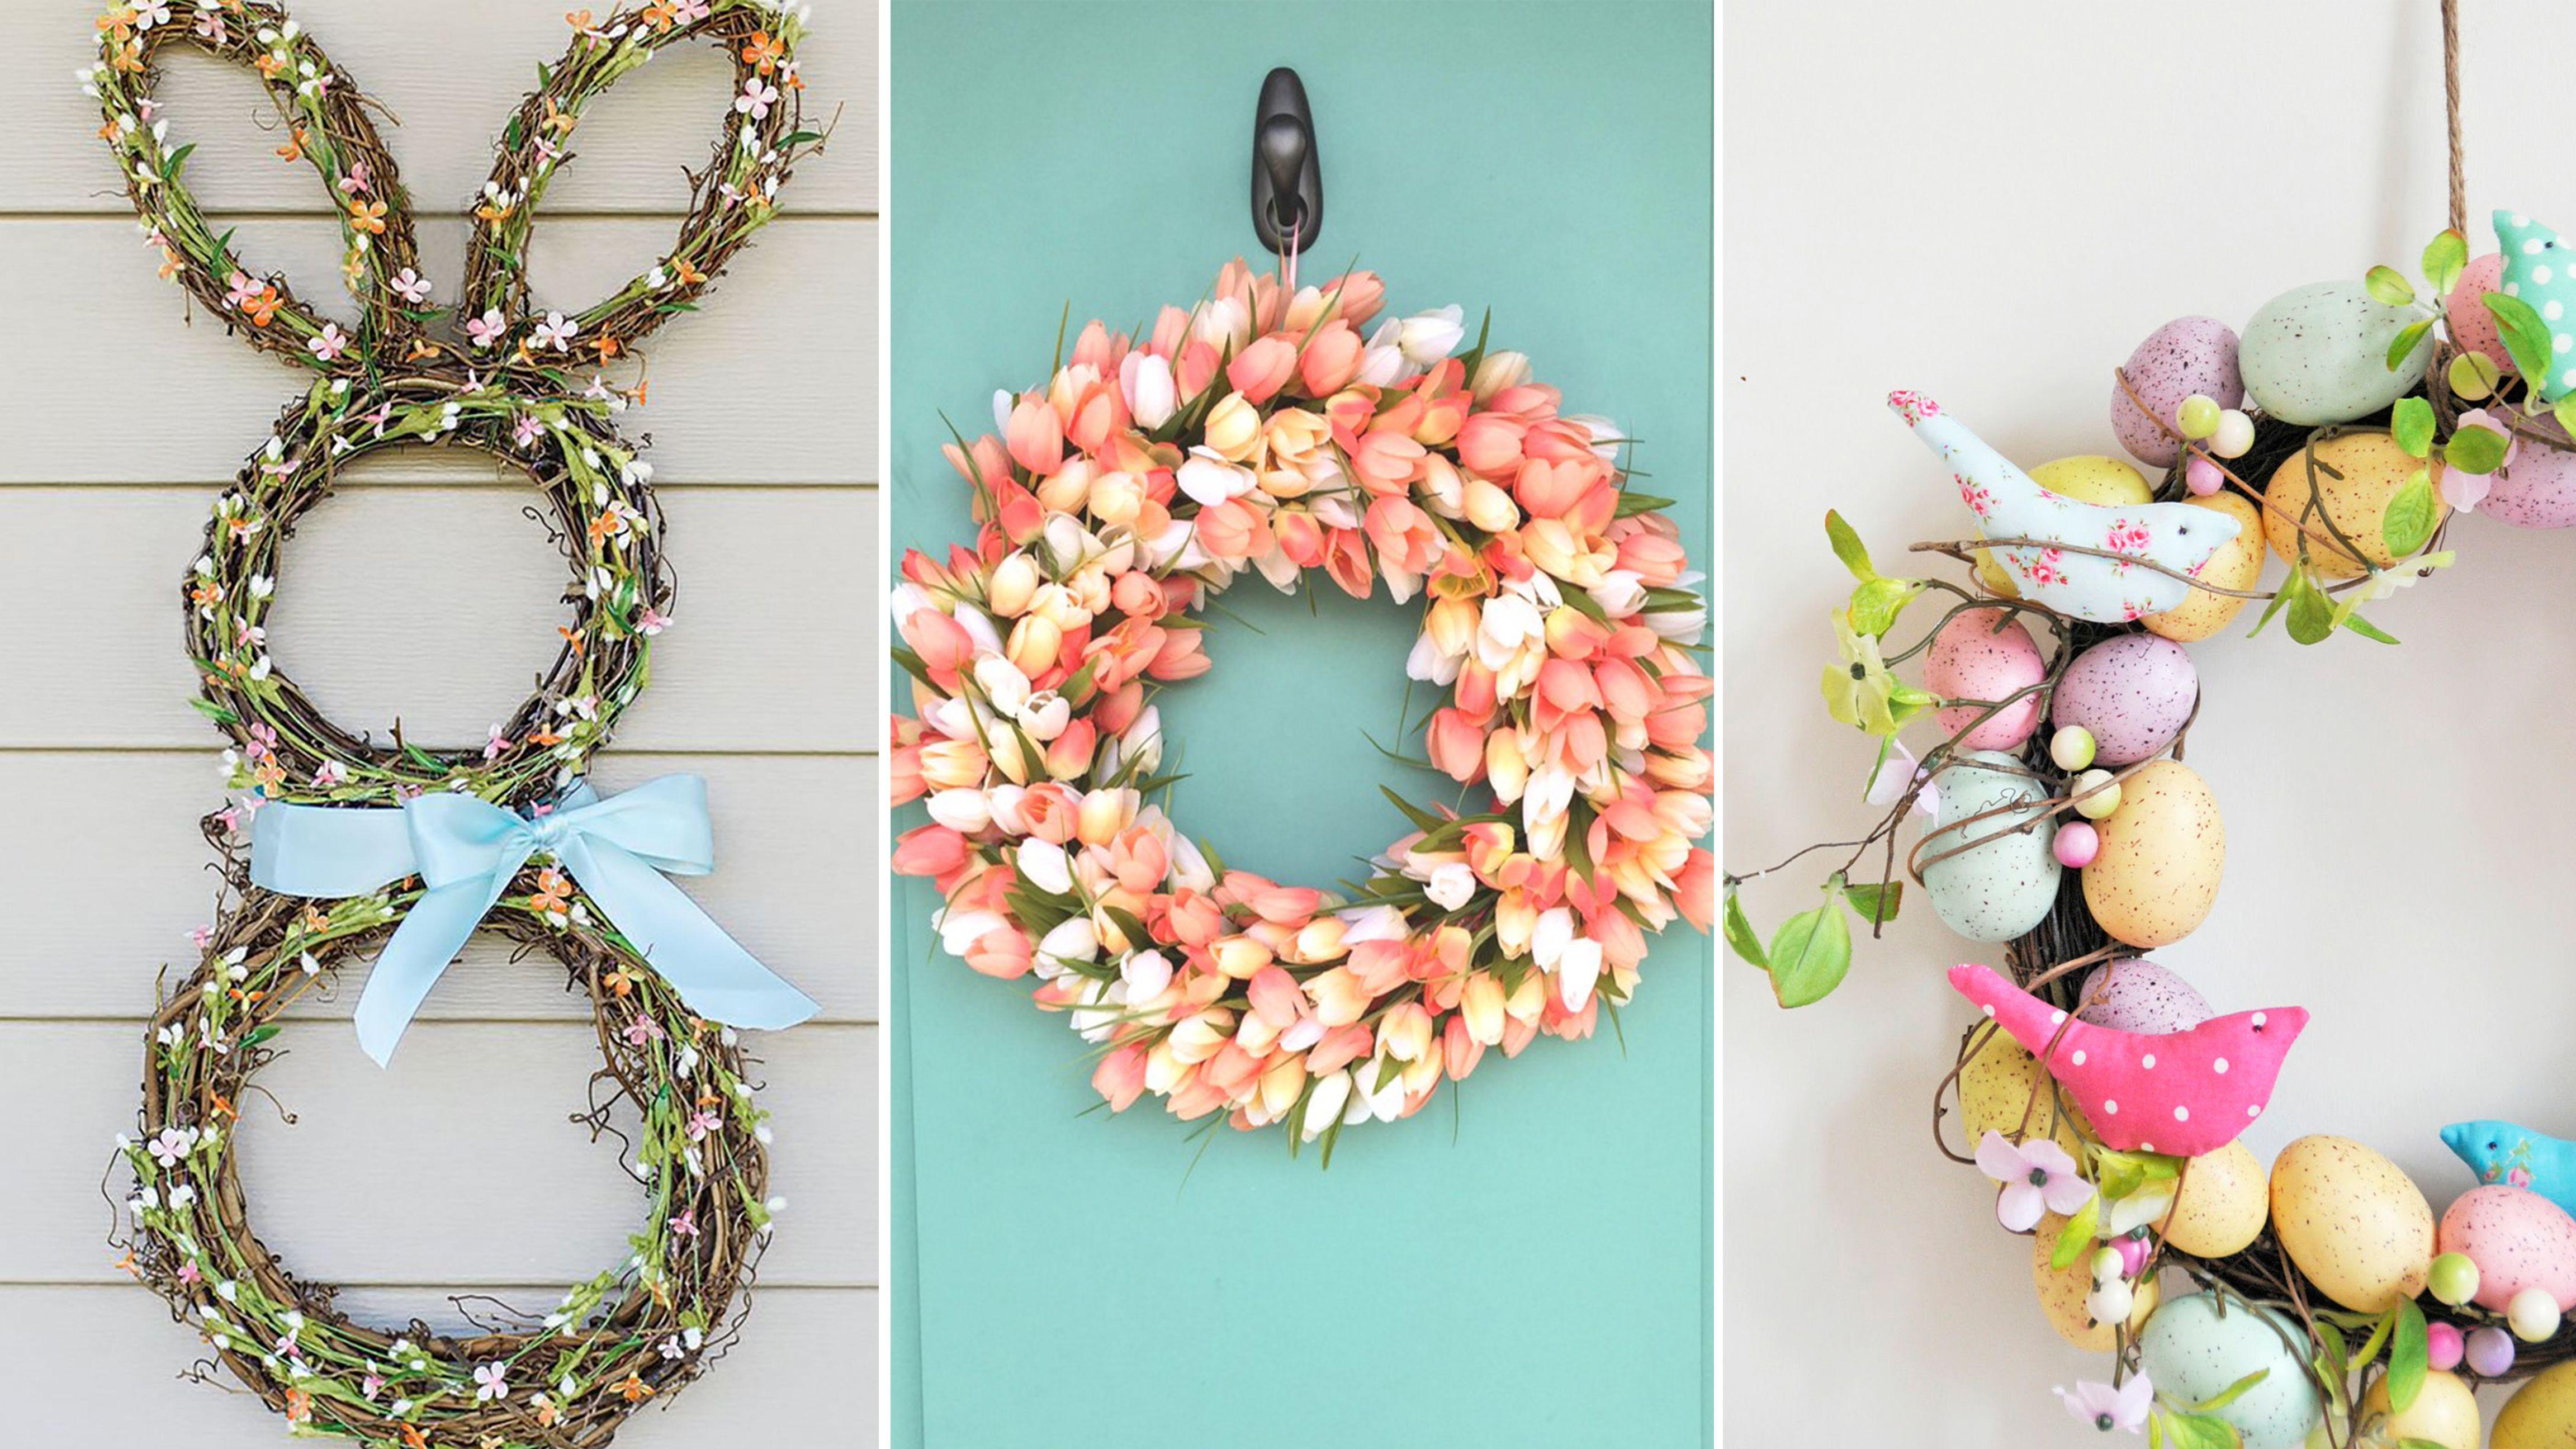 diy easter wreaths & 17 DIY Easter Wreath Ideas - How to Make a Cute Easter Door Wreath